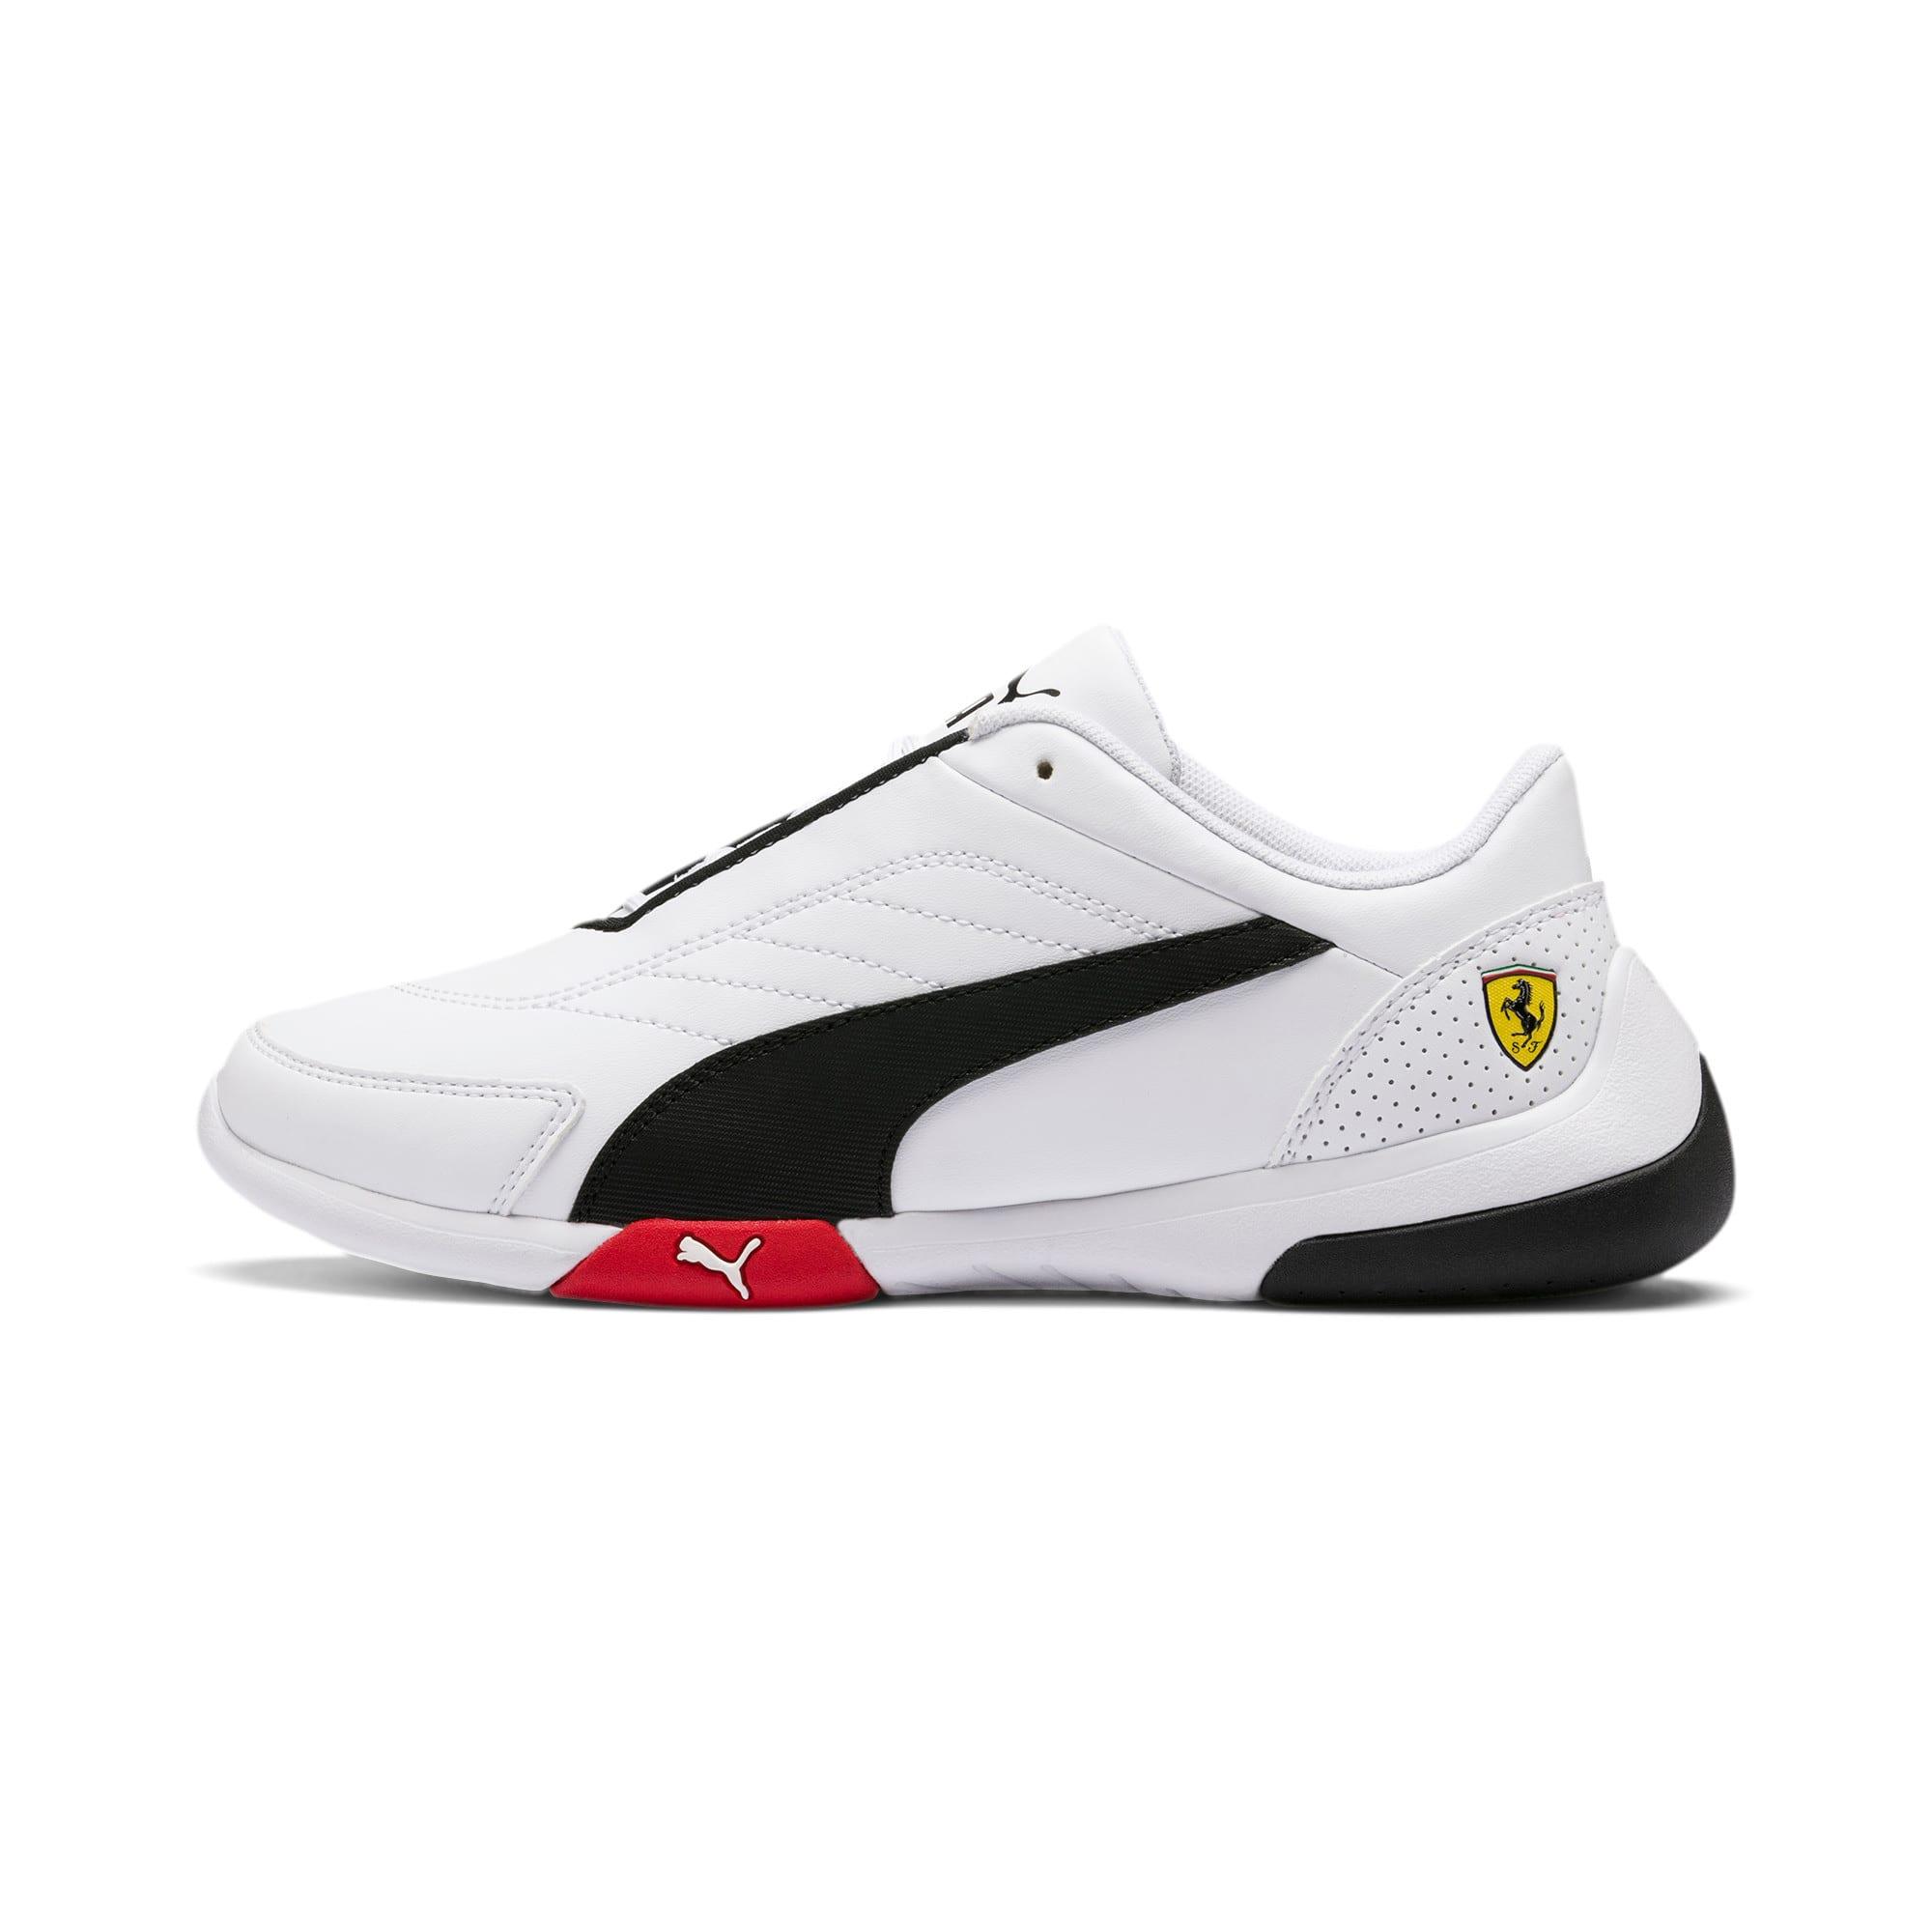 Thumbnail 1 of Ferrari Kart Cat III Youth Trainers, White-Black-Rosso Corsa, medium